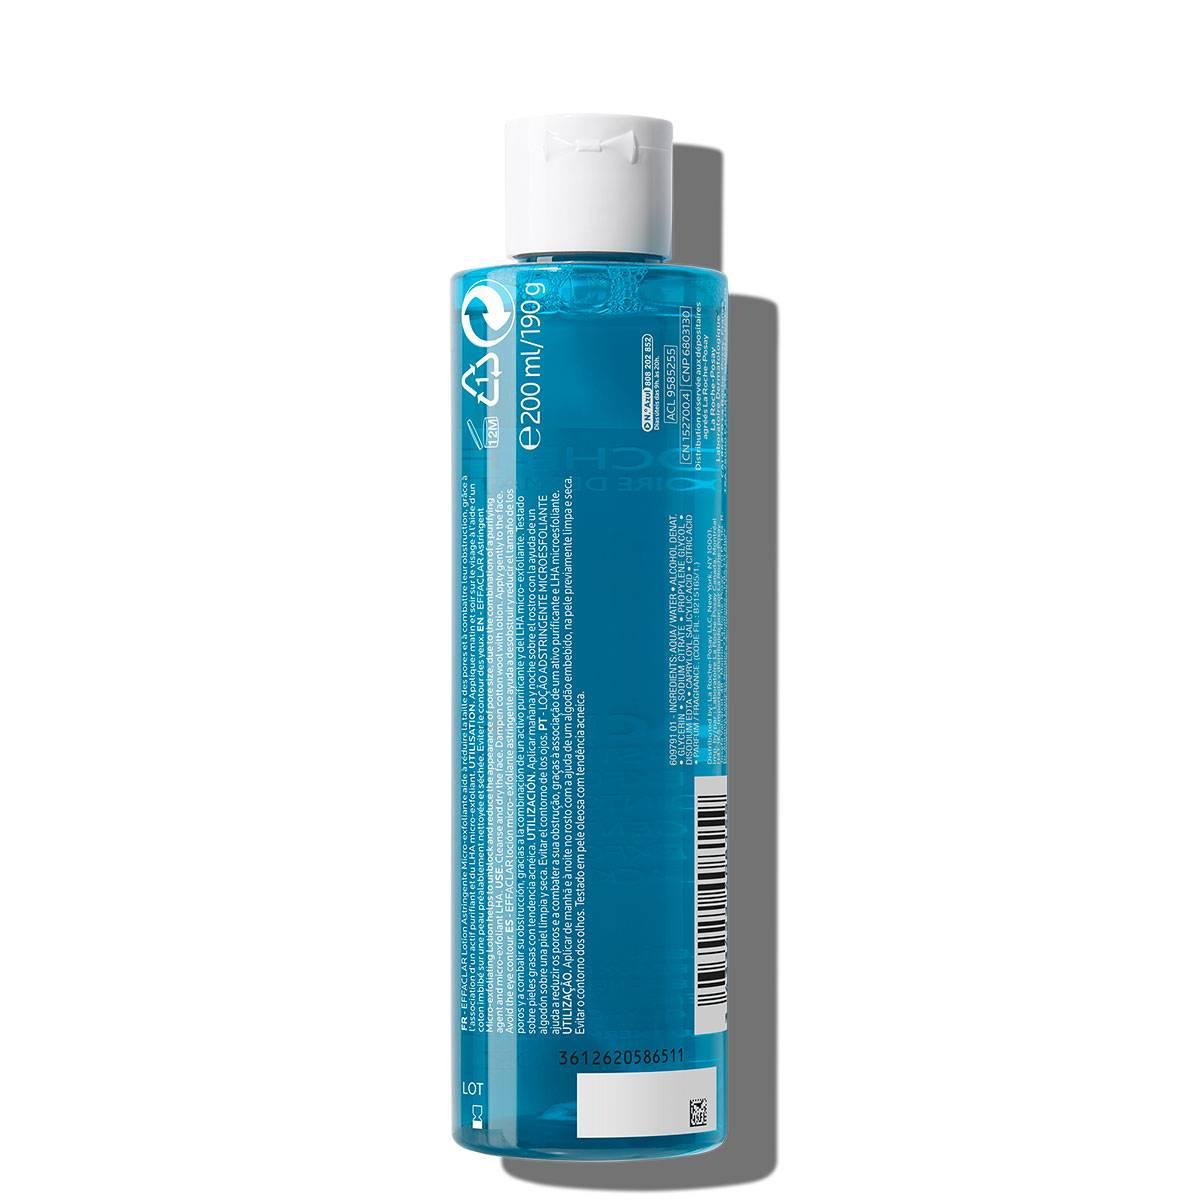 La Roche Posay Face Care Effaclar Micro Exfoliating Astringent Toner 2